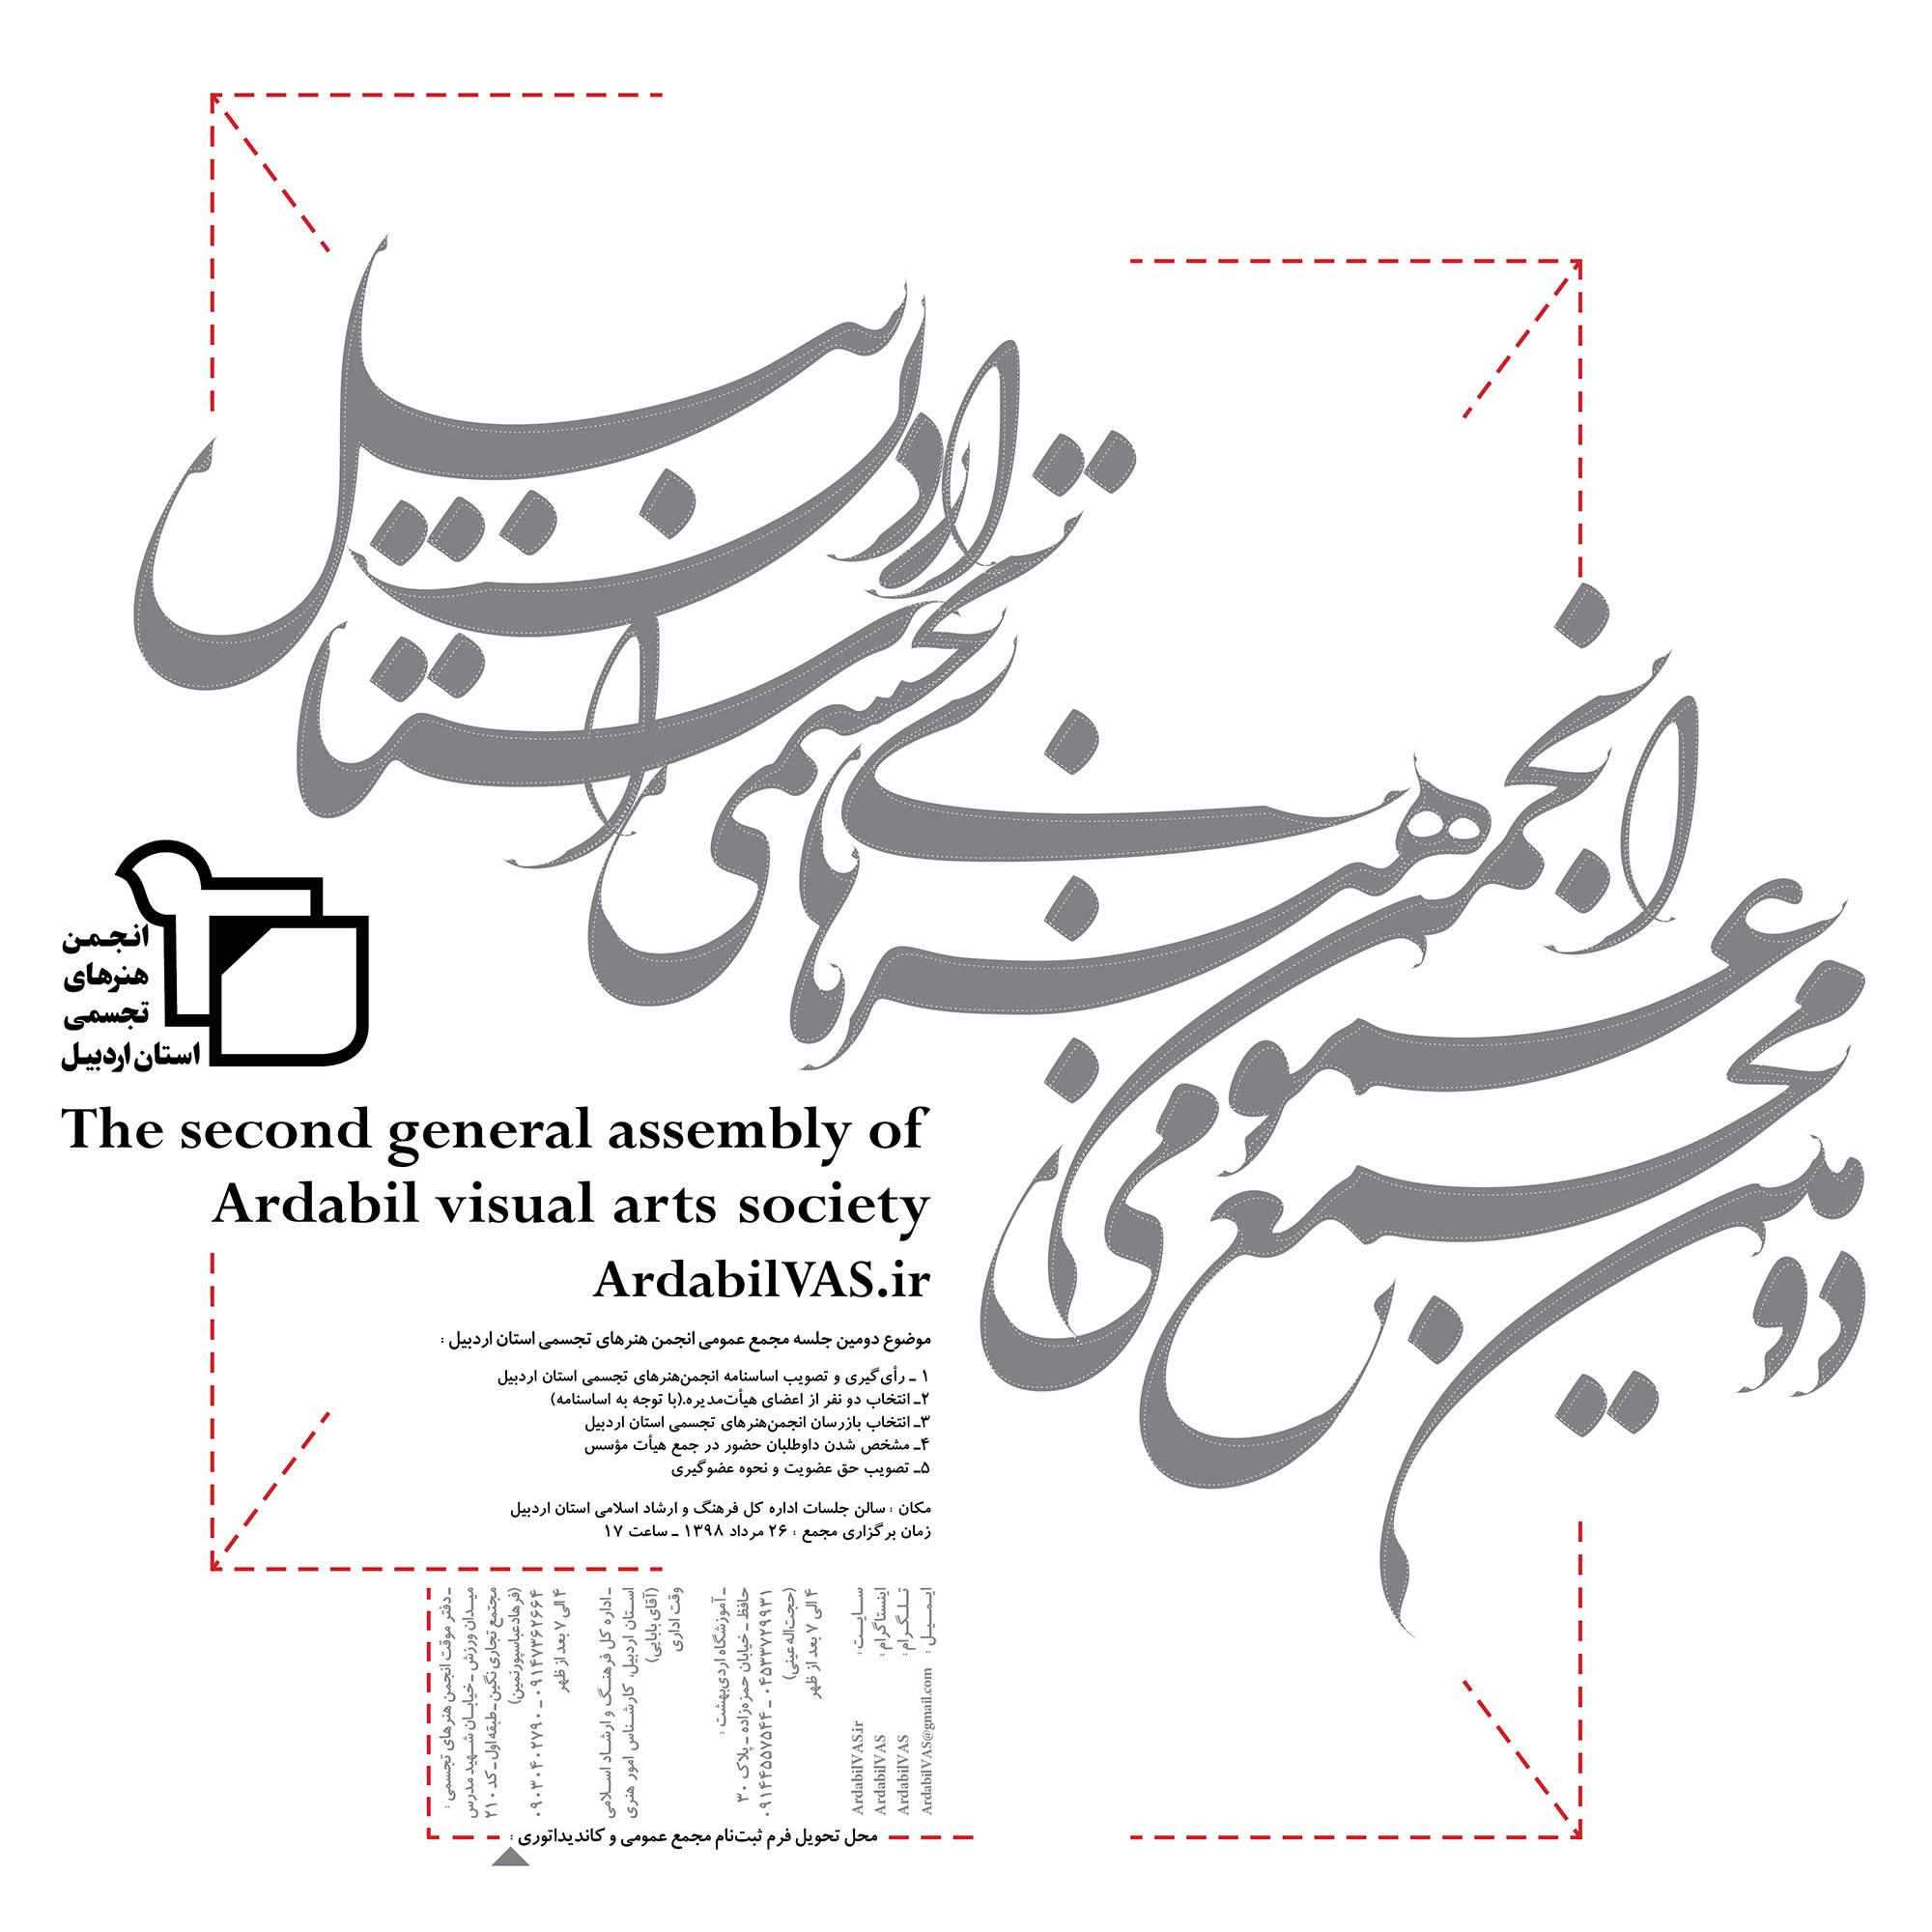 Photo of فراخوان دومین مجمع عمومی انجمن هنرهای تجسمی استان اردبیل منتشر شد